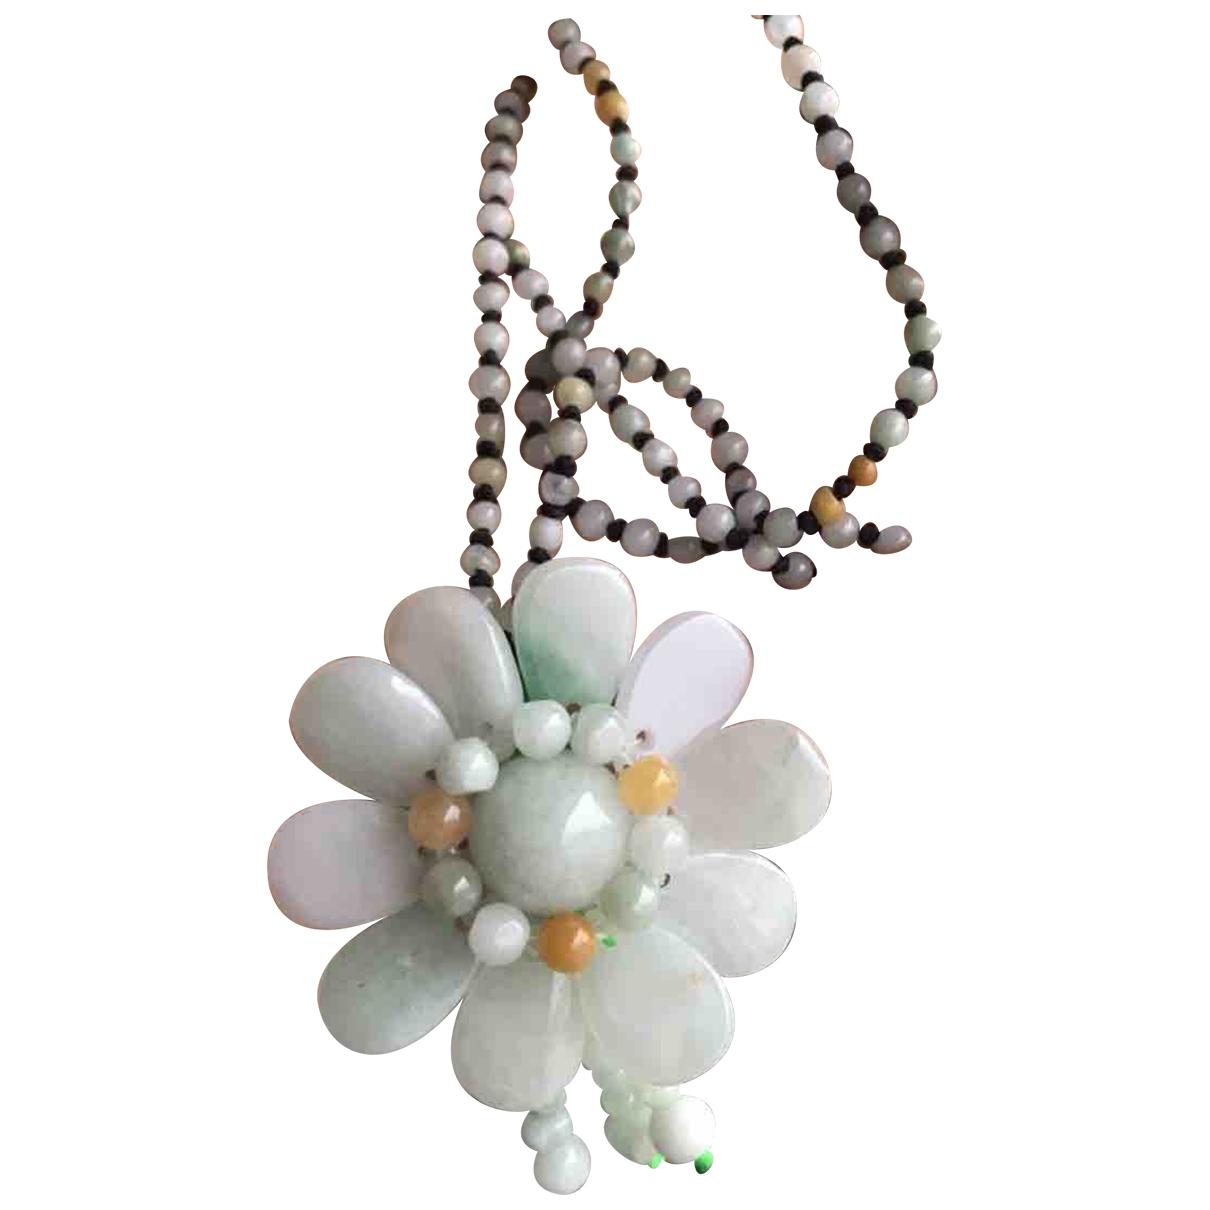 Collar Motifs Floraux de Jade Non Signe / Unsigned